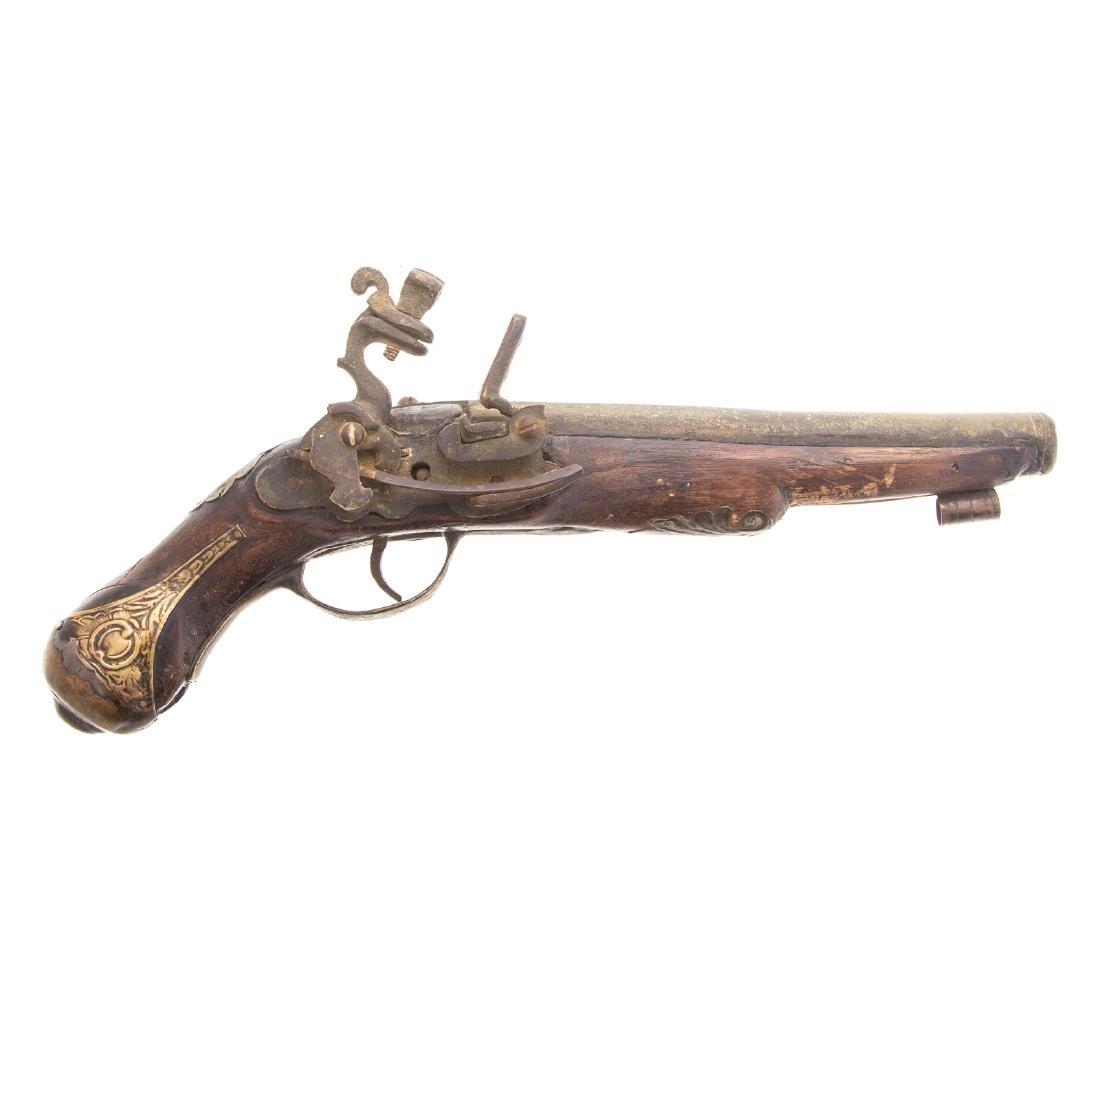 1700s Flintlock pistol